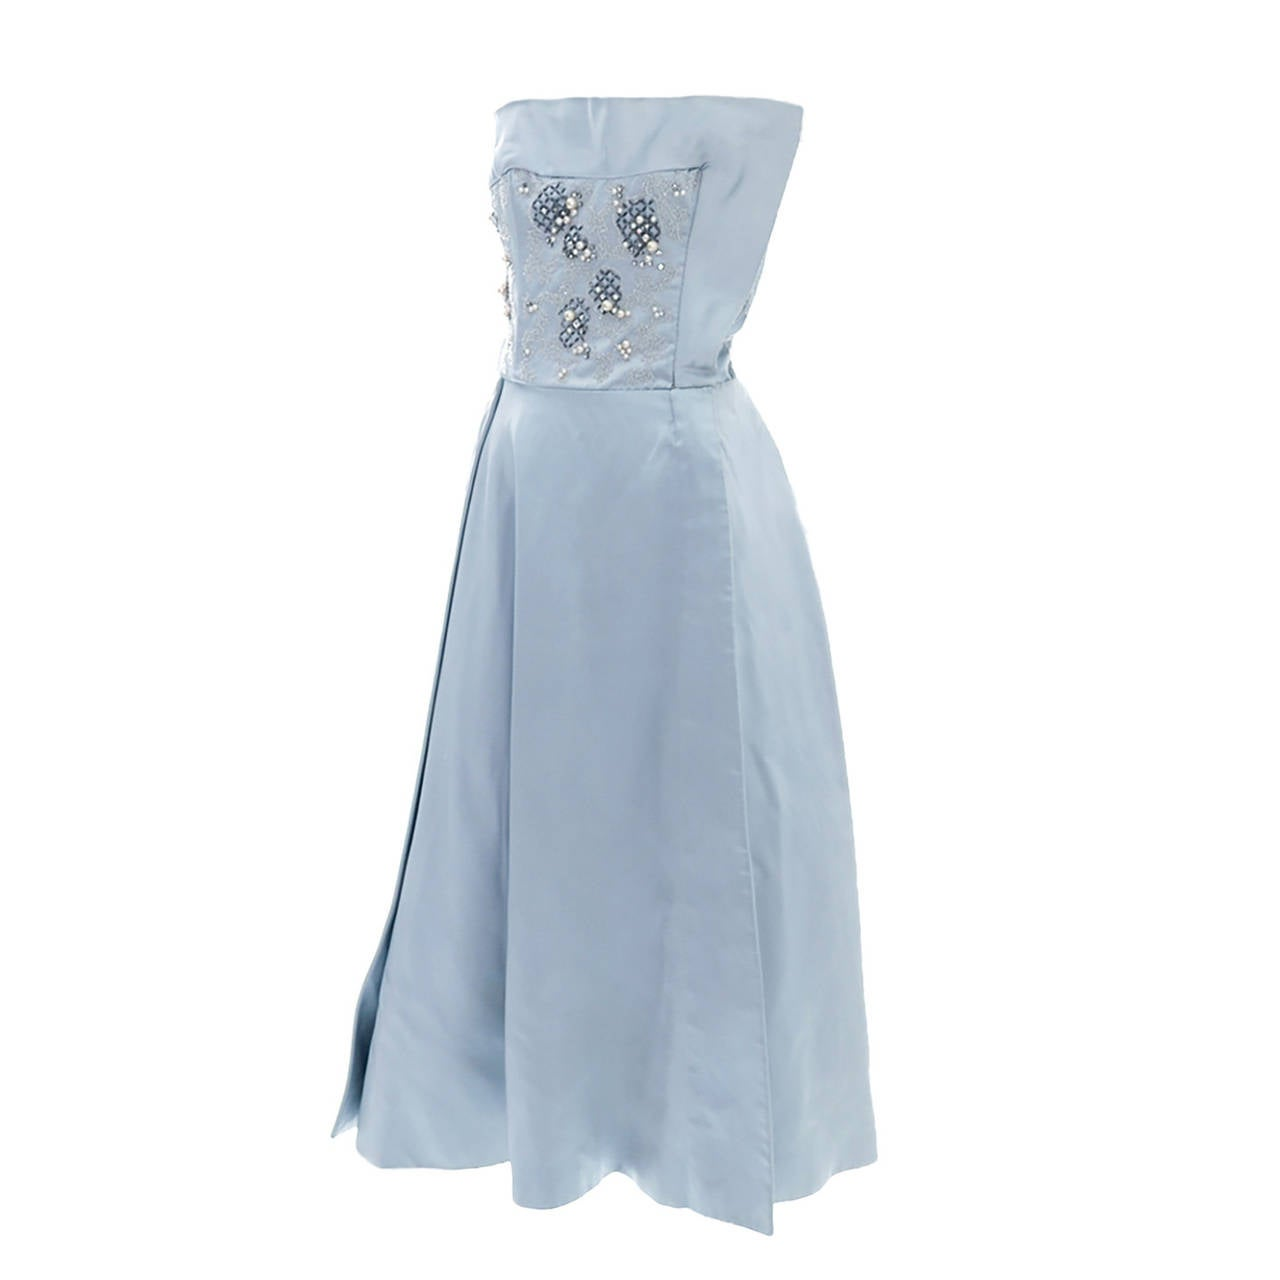 1950s Harvey Berin Karen Stark Vintage Dress in Blue Satin Beaded W Rhinestones